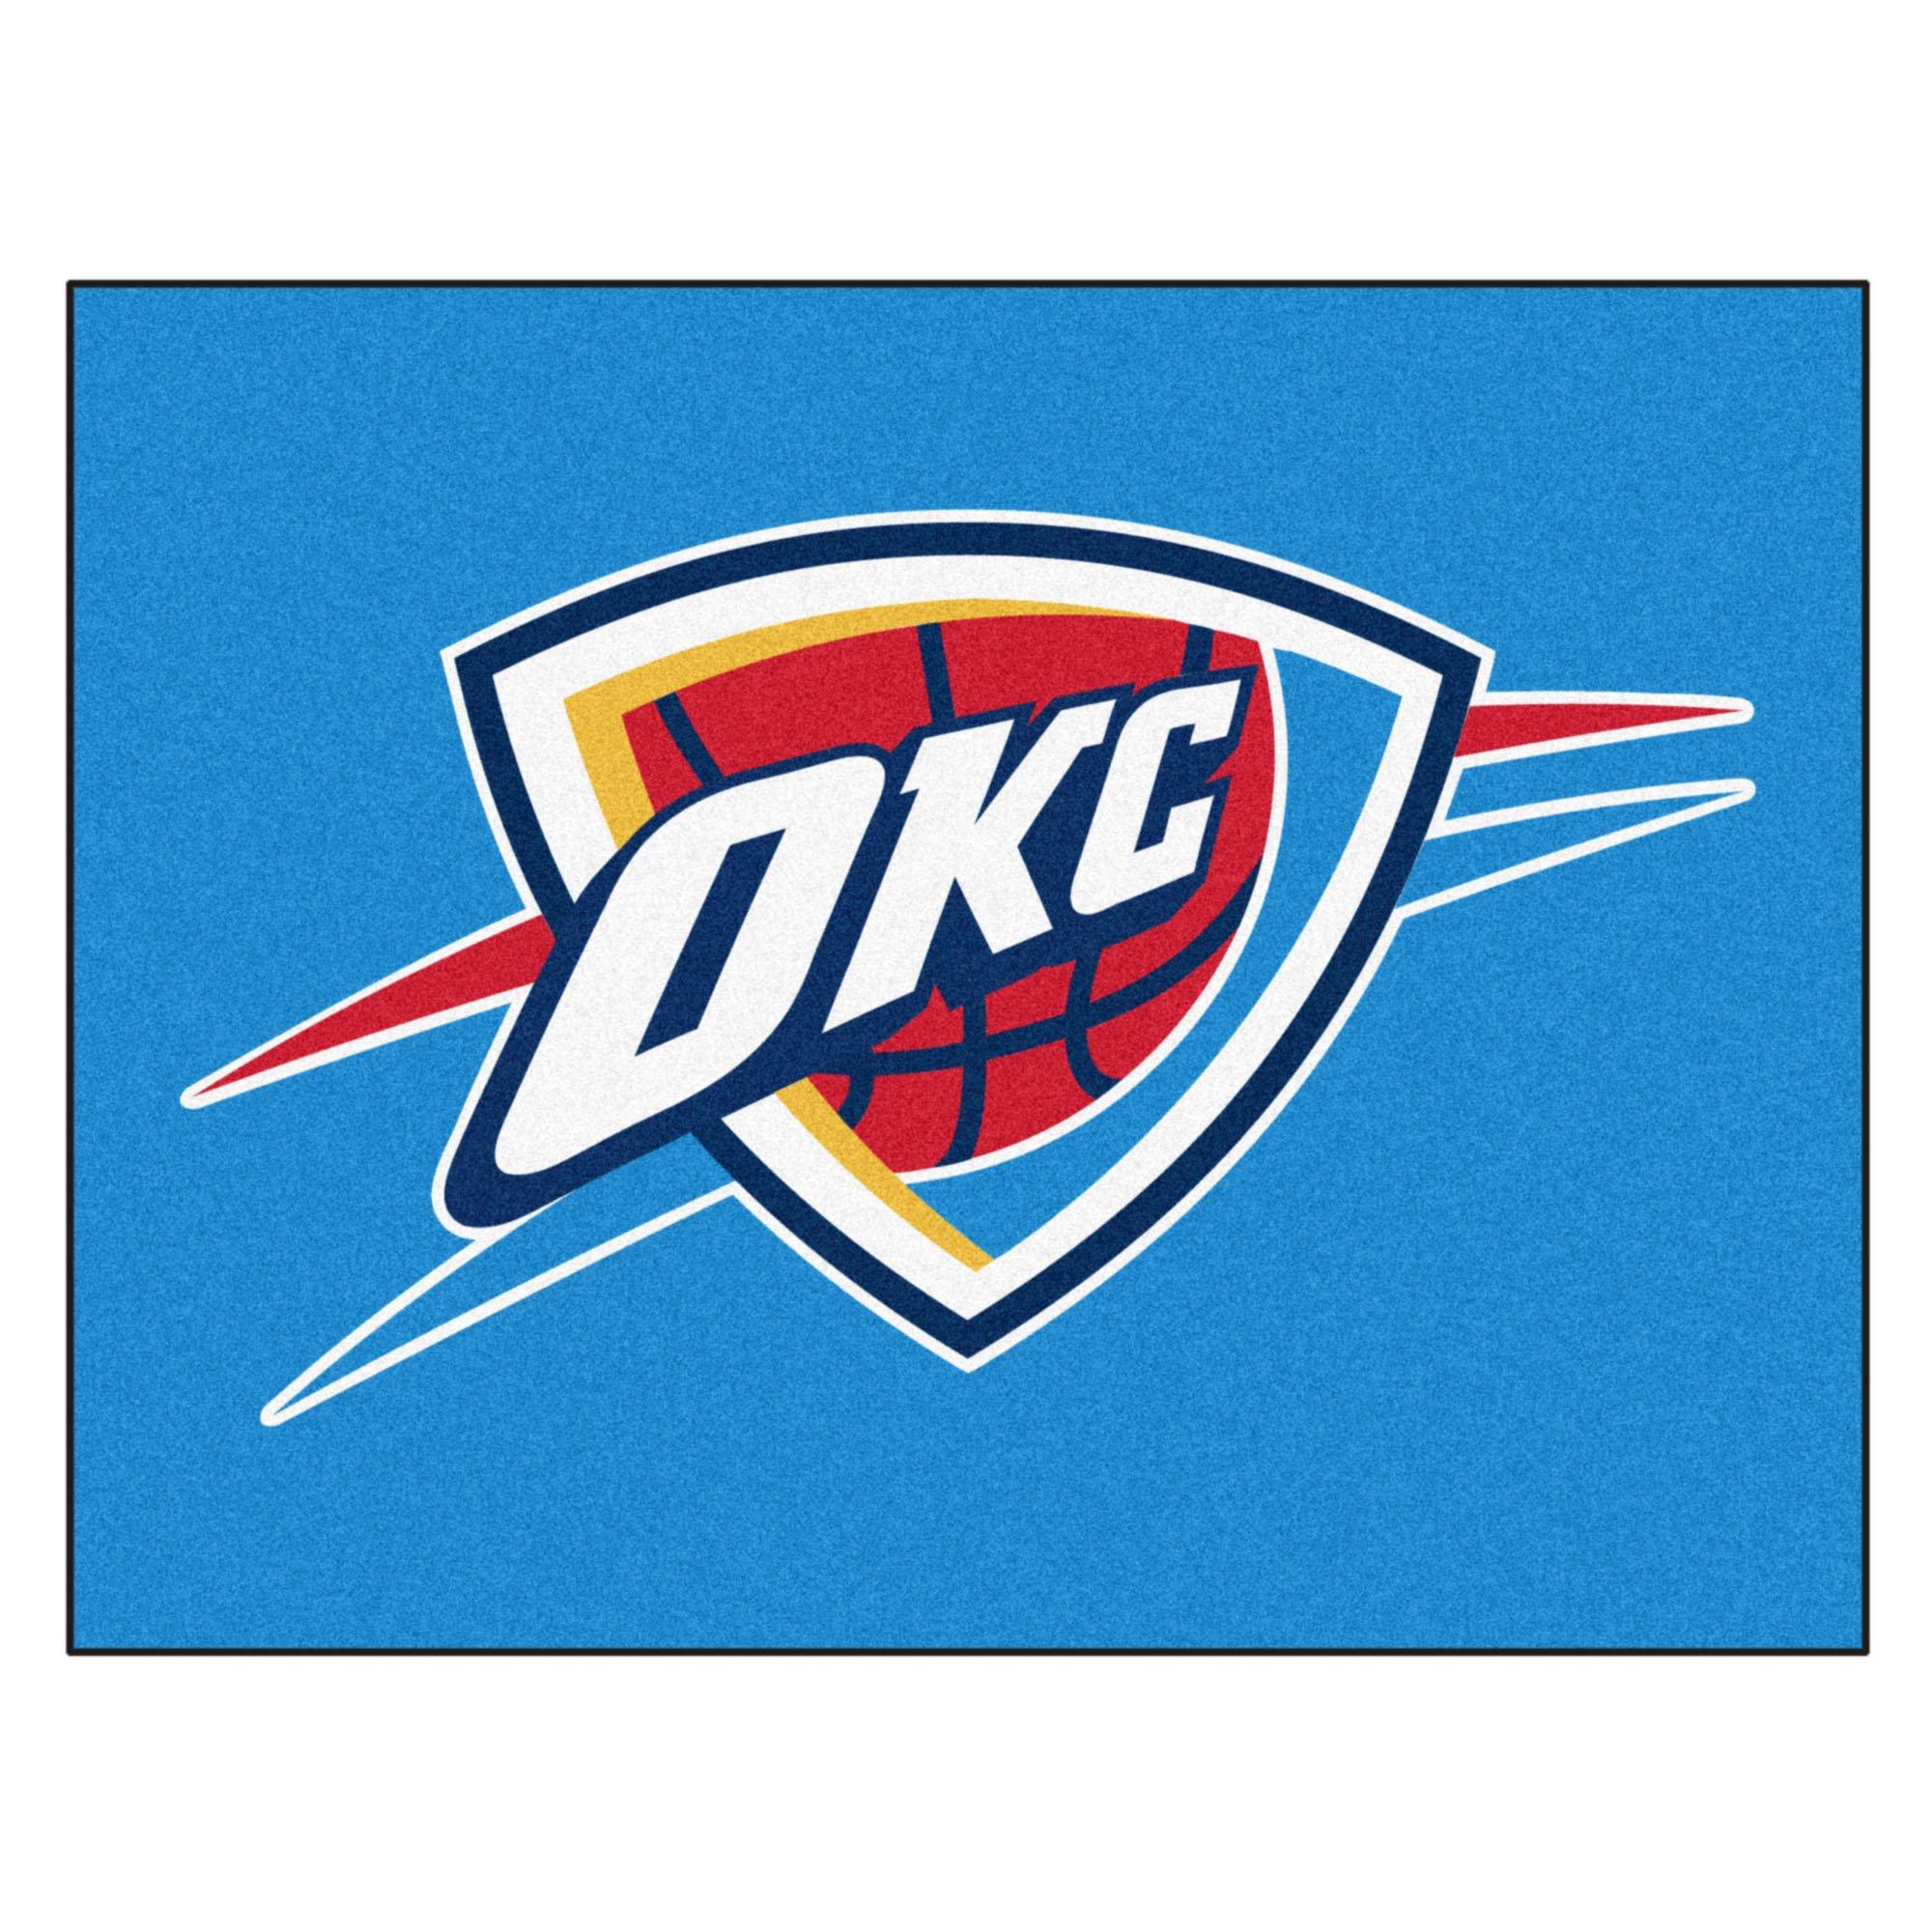 Fanmats 19463 33.75''x42.5'' Team Color NBA - Oklahoma City Thunder All-Star Mat